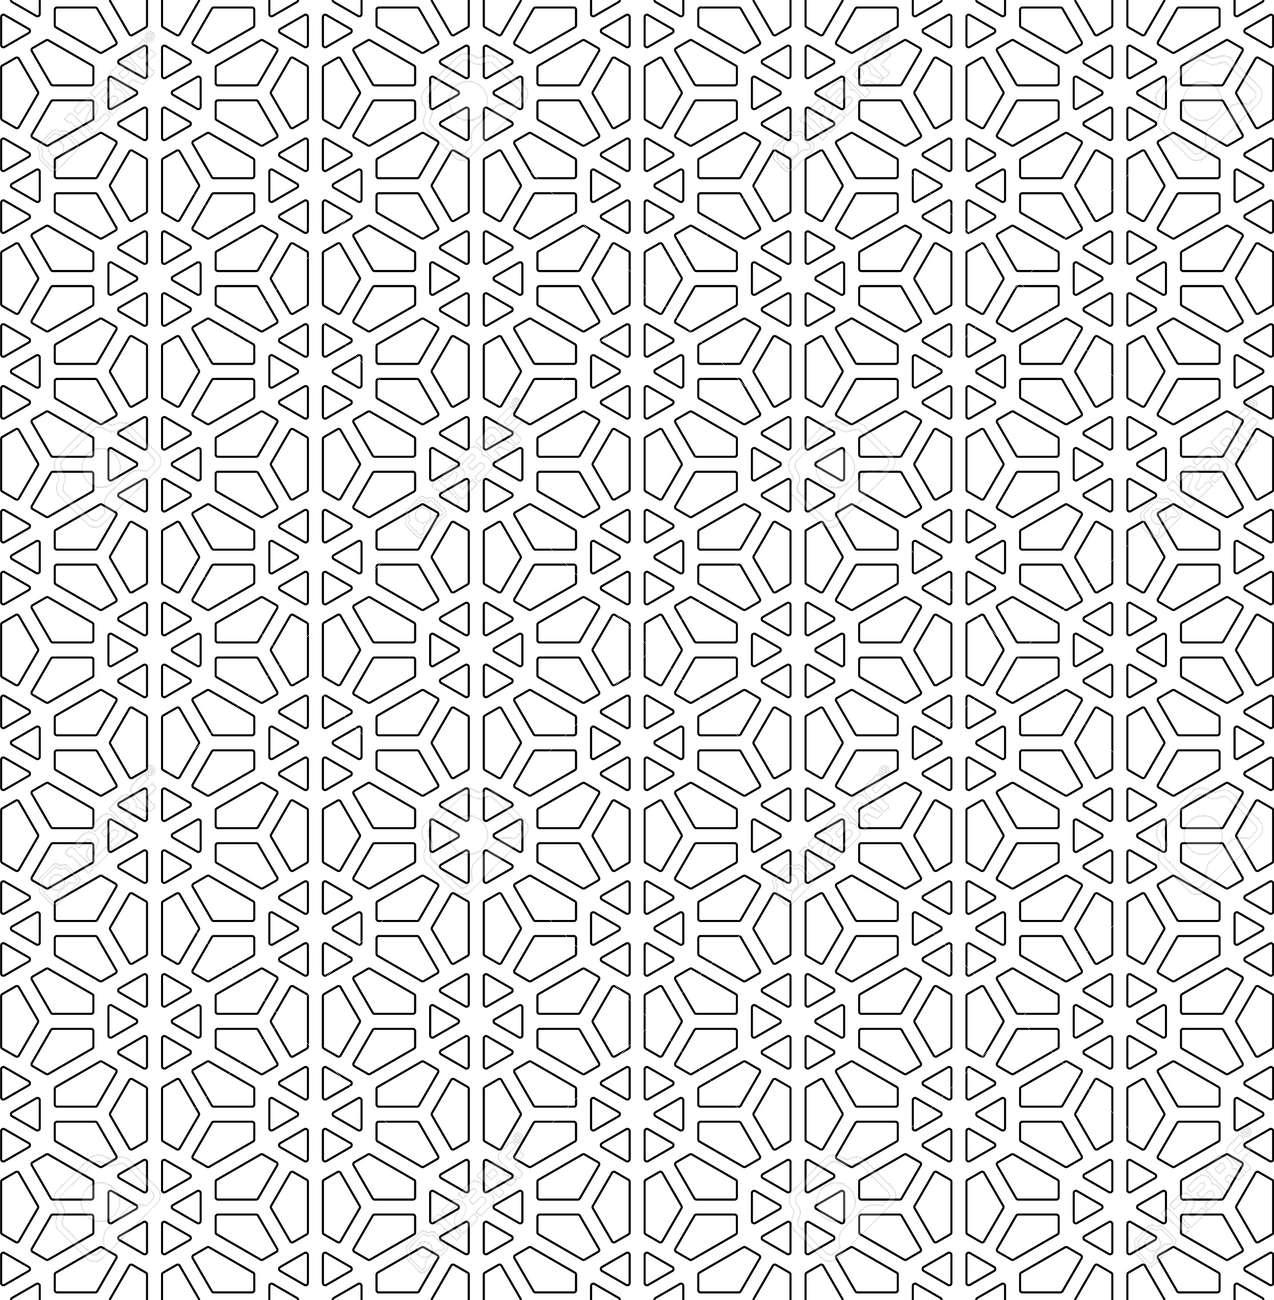 Seamless pattern based on Japanese ornament Kumiko.Black and white.Rounded corners. - 126087549